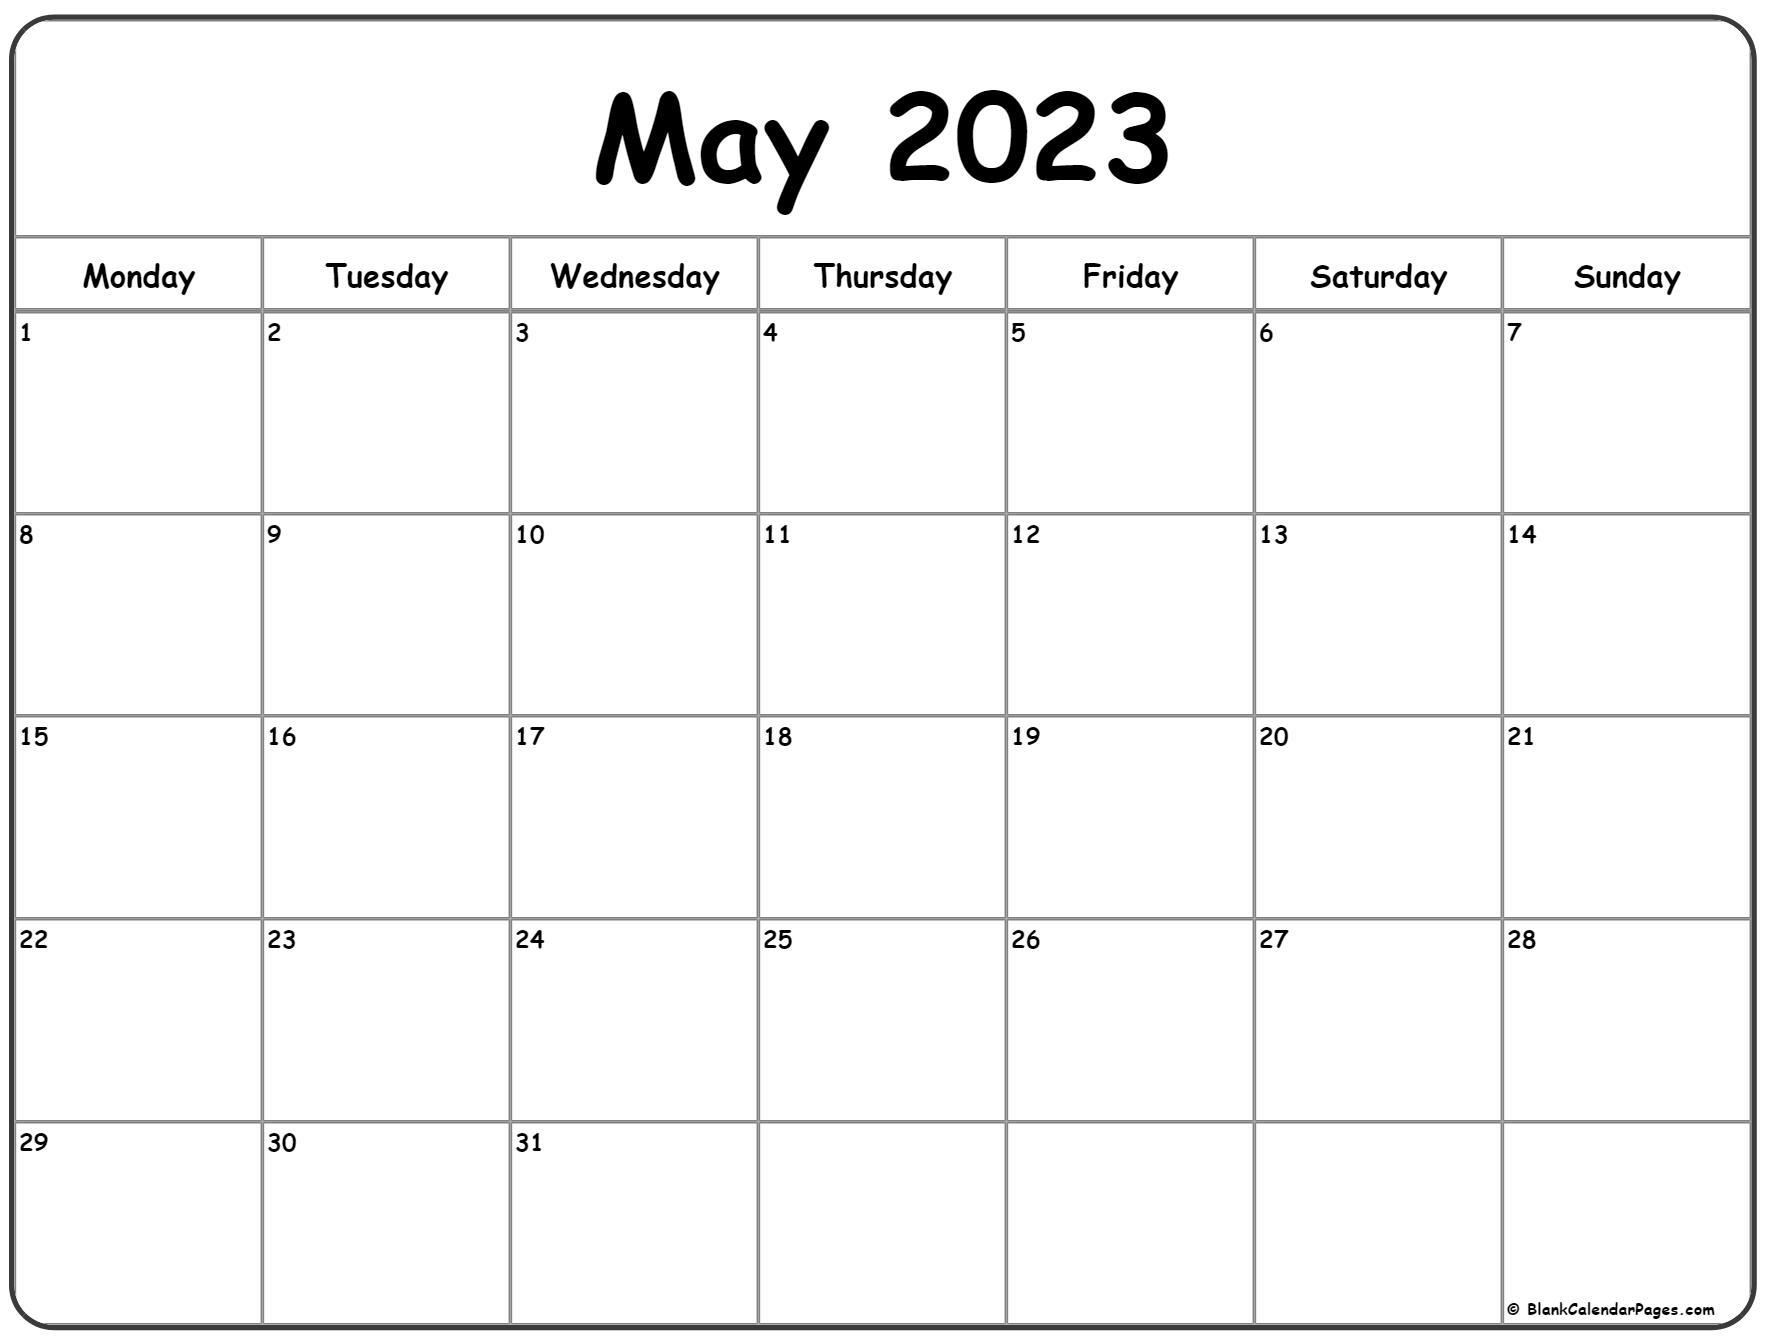 May 2023 Monday calendar. Monday to Sunday